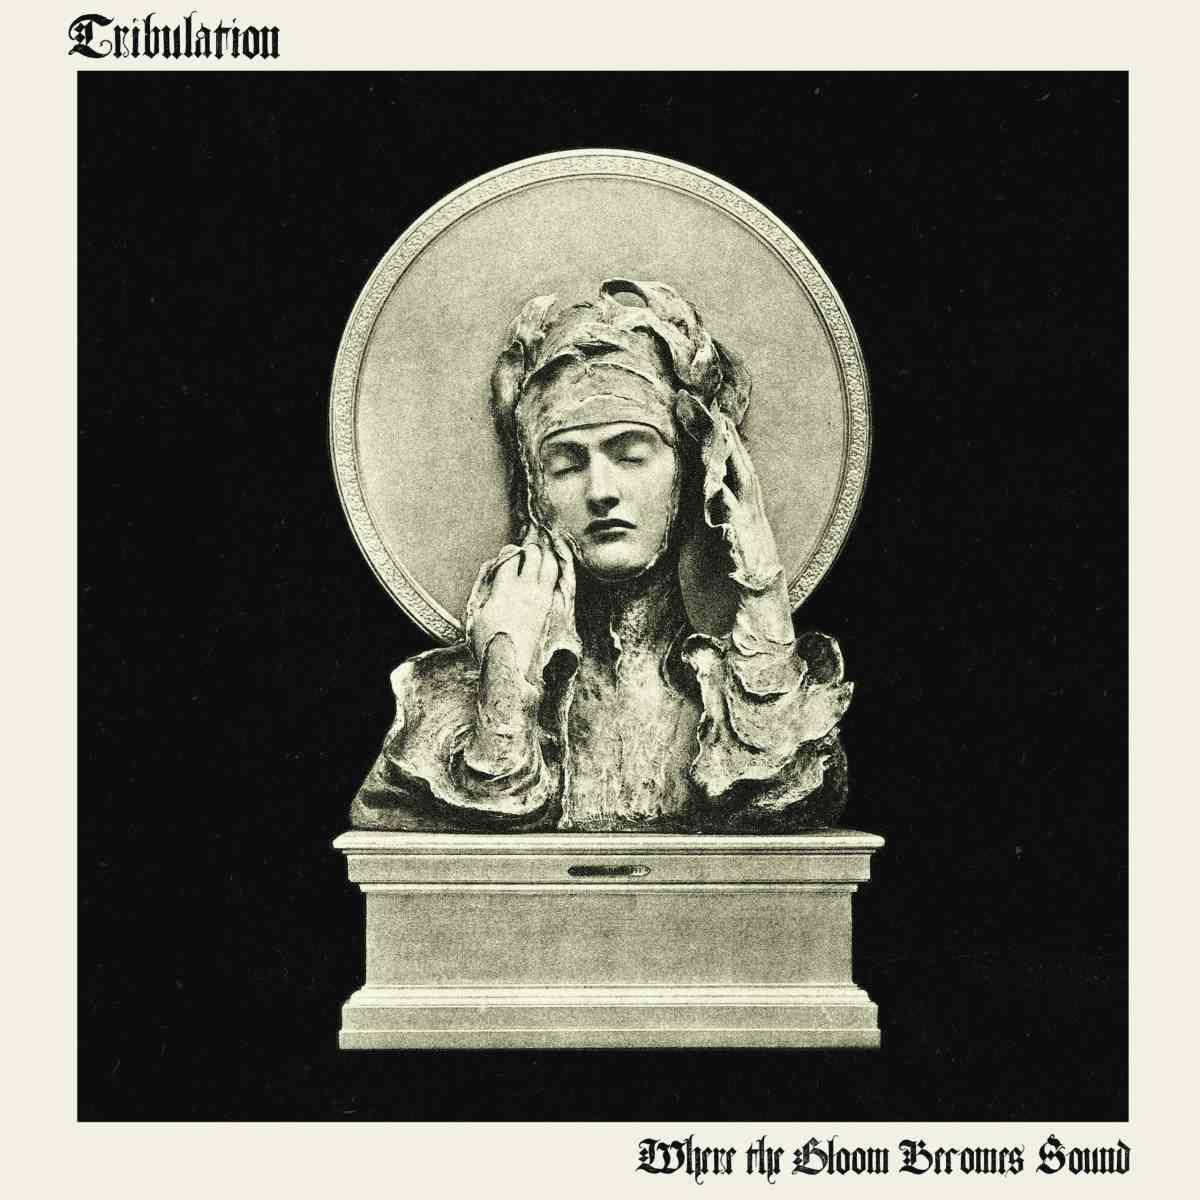 TRIBULATION - Where The Gloom Becomes Sound - album cover